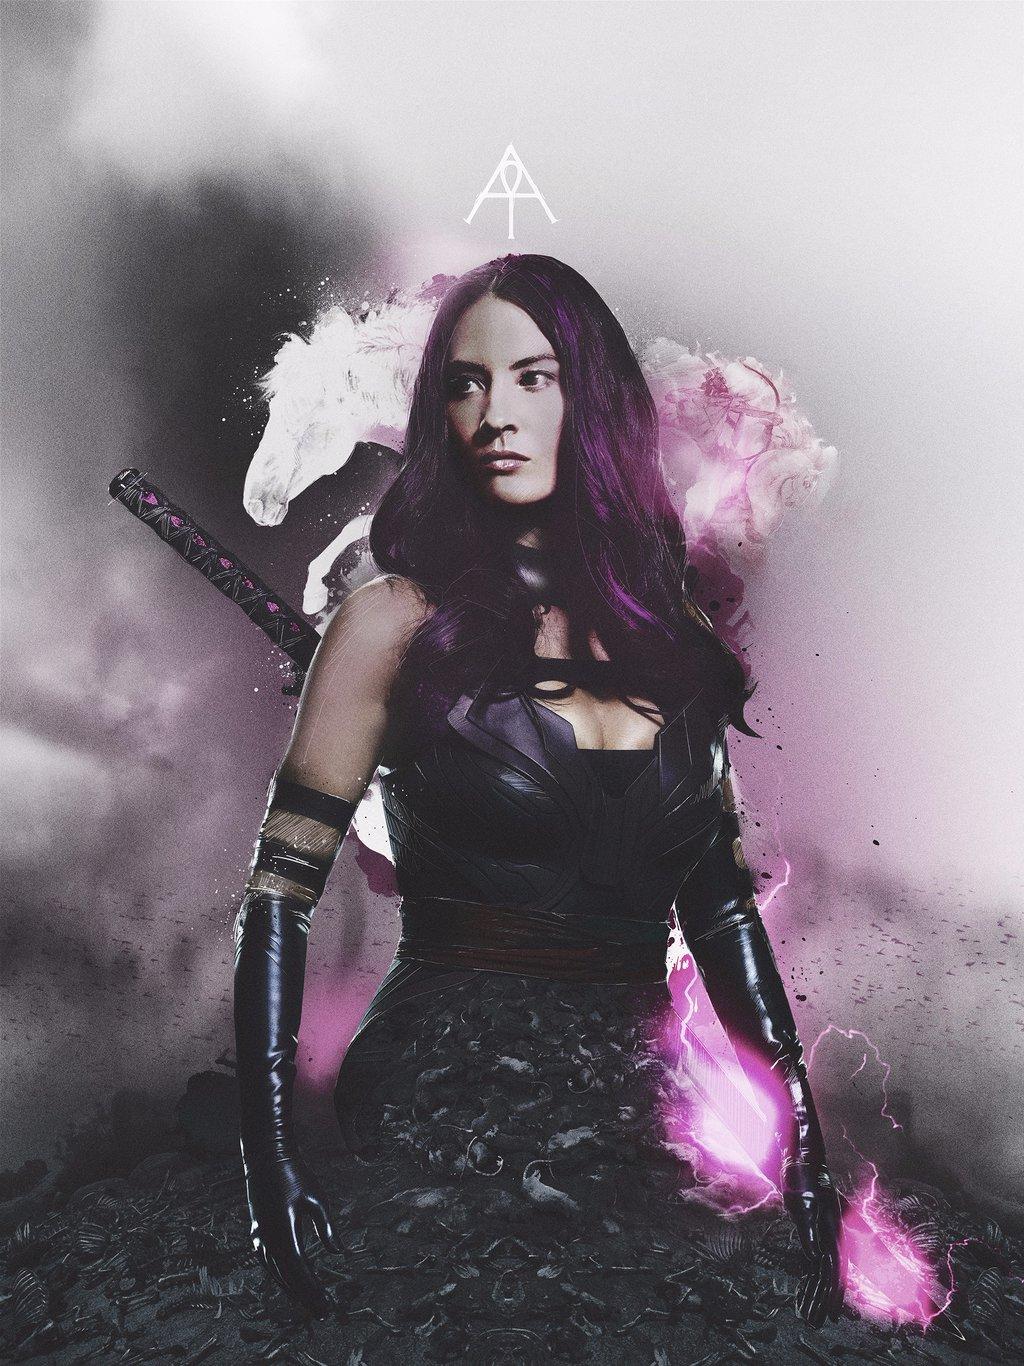 X-Men: Apocalisse - Il character poster di Psylocke, interpretata da Olivia Munn